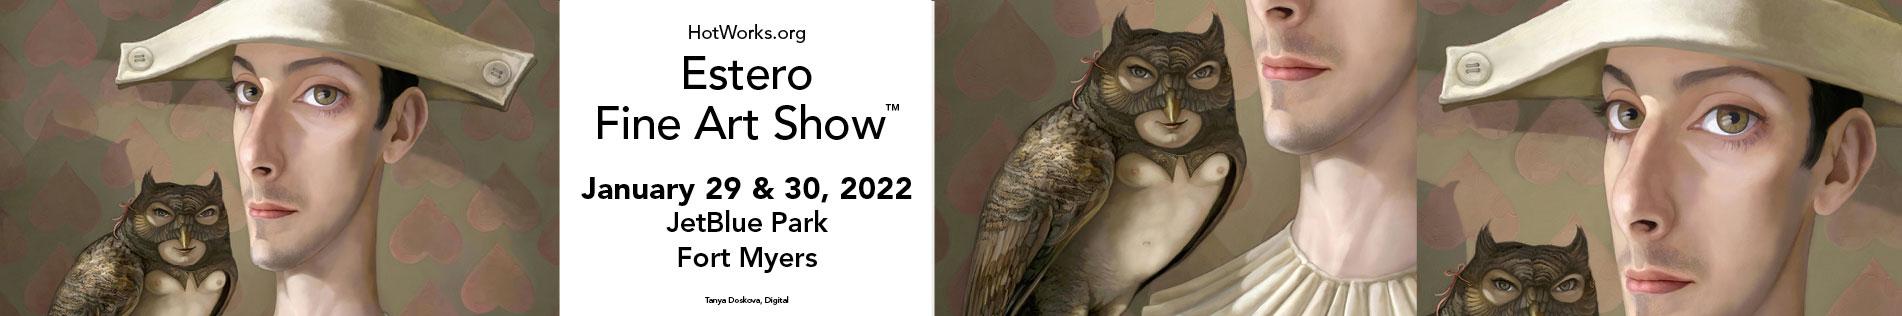 Estero Fine Art Show January 29 & 30, 2022